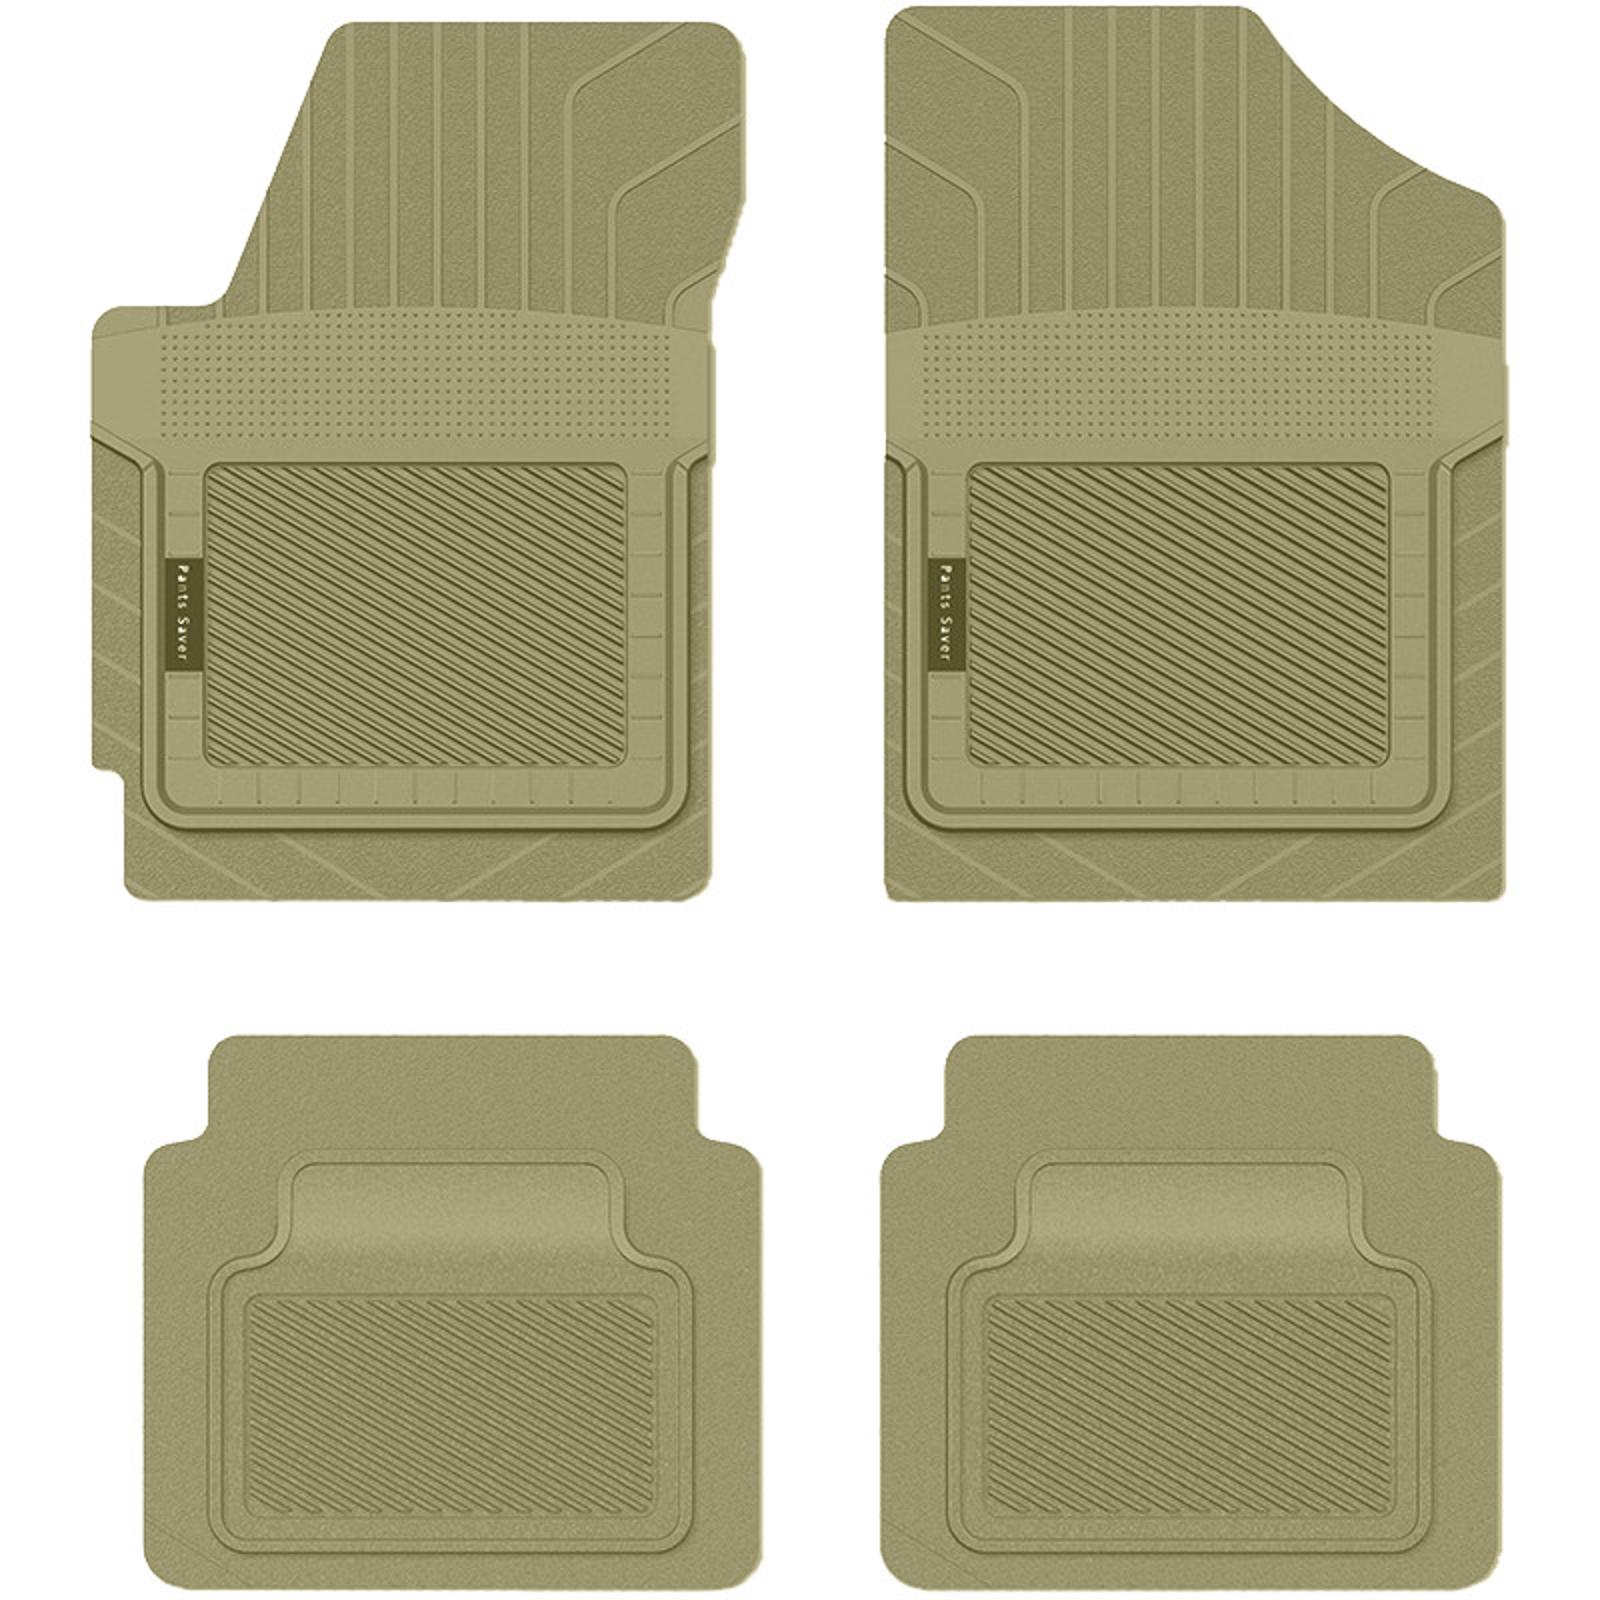 Koolatron Pants Saver Custom Fit Car Mat 4PC BUICK PARK AVENUE 2001 Tan PartNumber: 02836096000P KsnValue: 02836096000 MfgPartNumber: 4507013